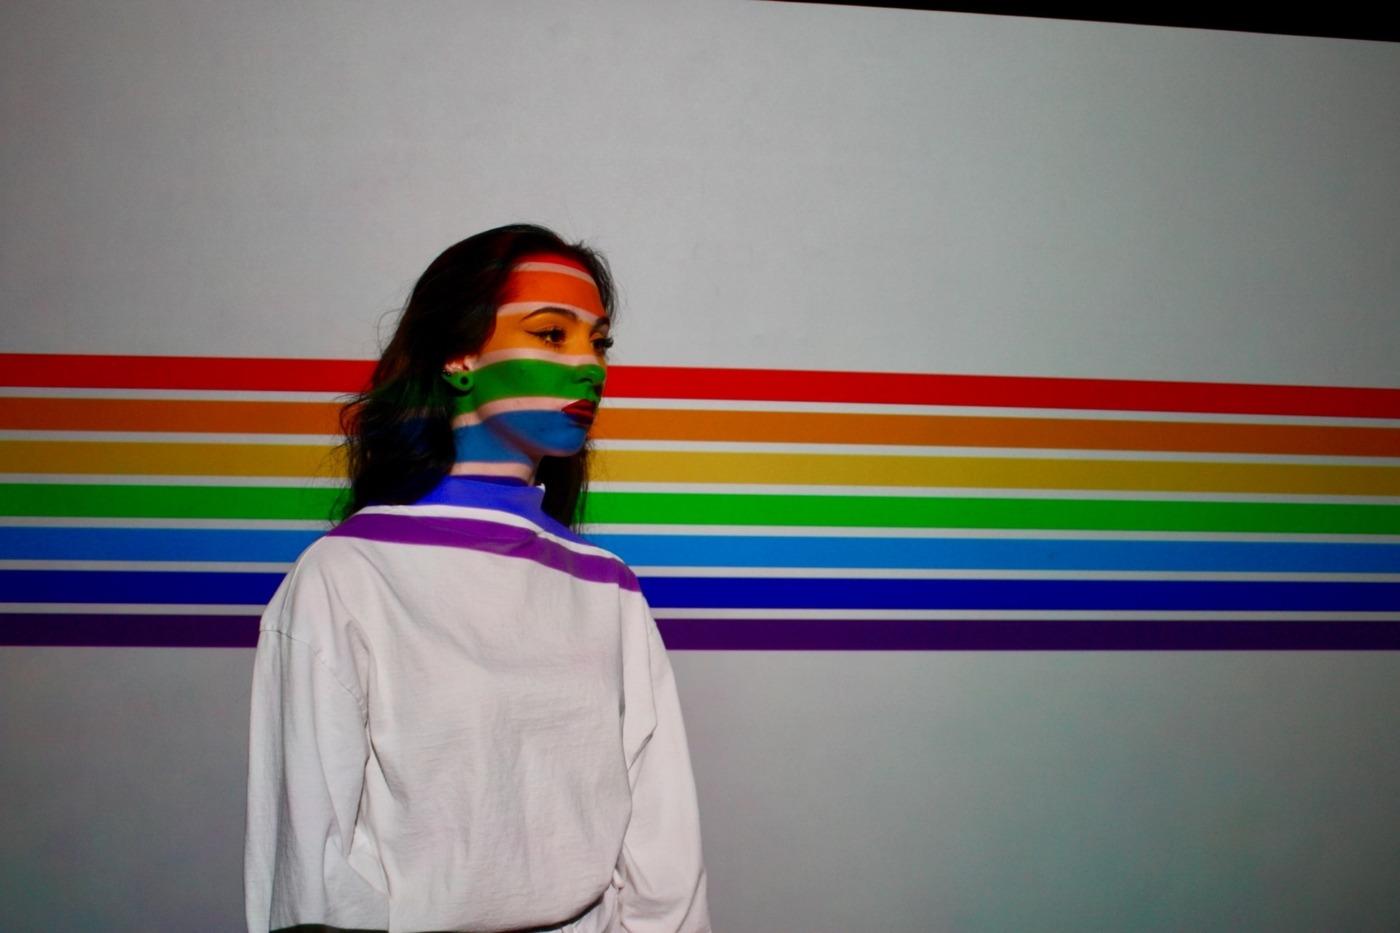 LGBT art